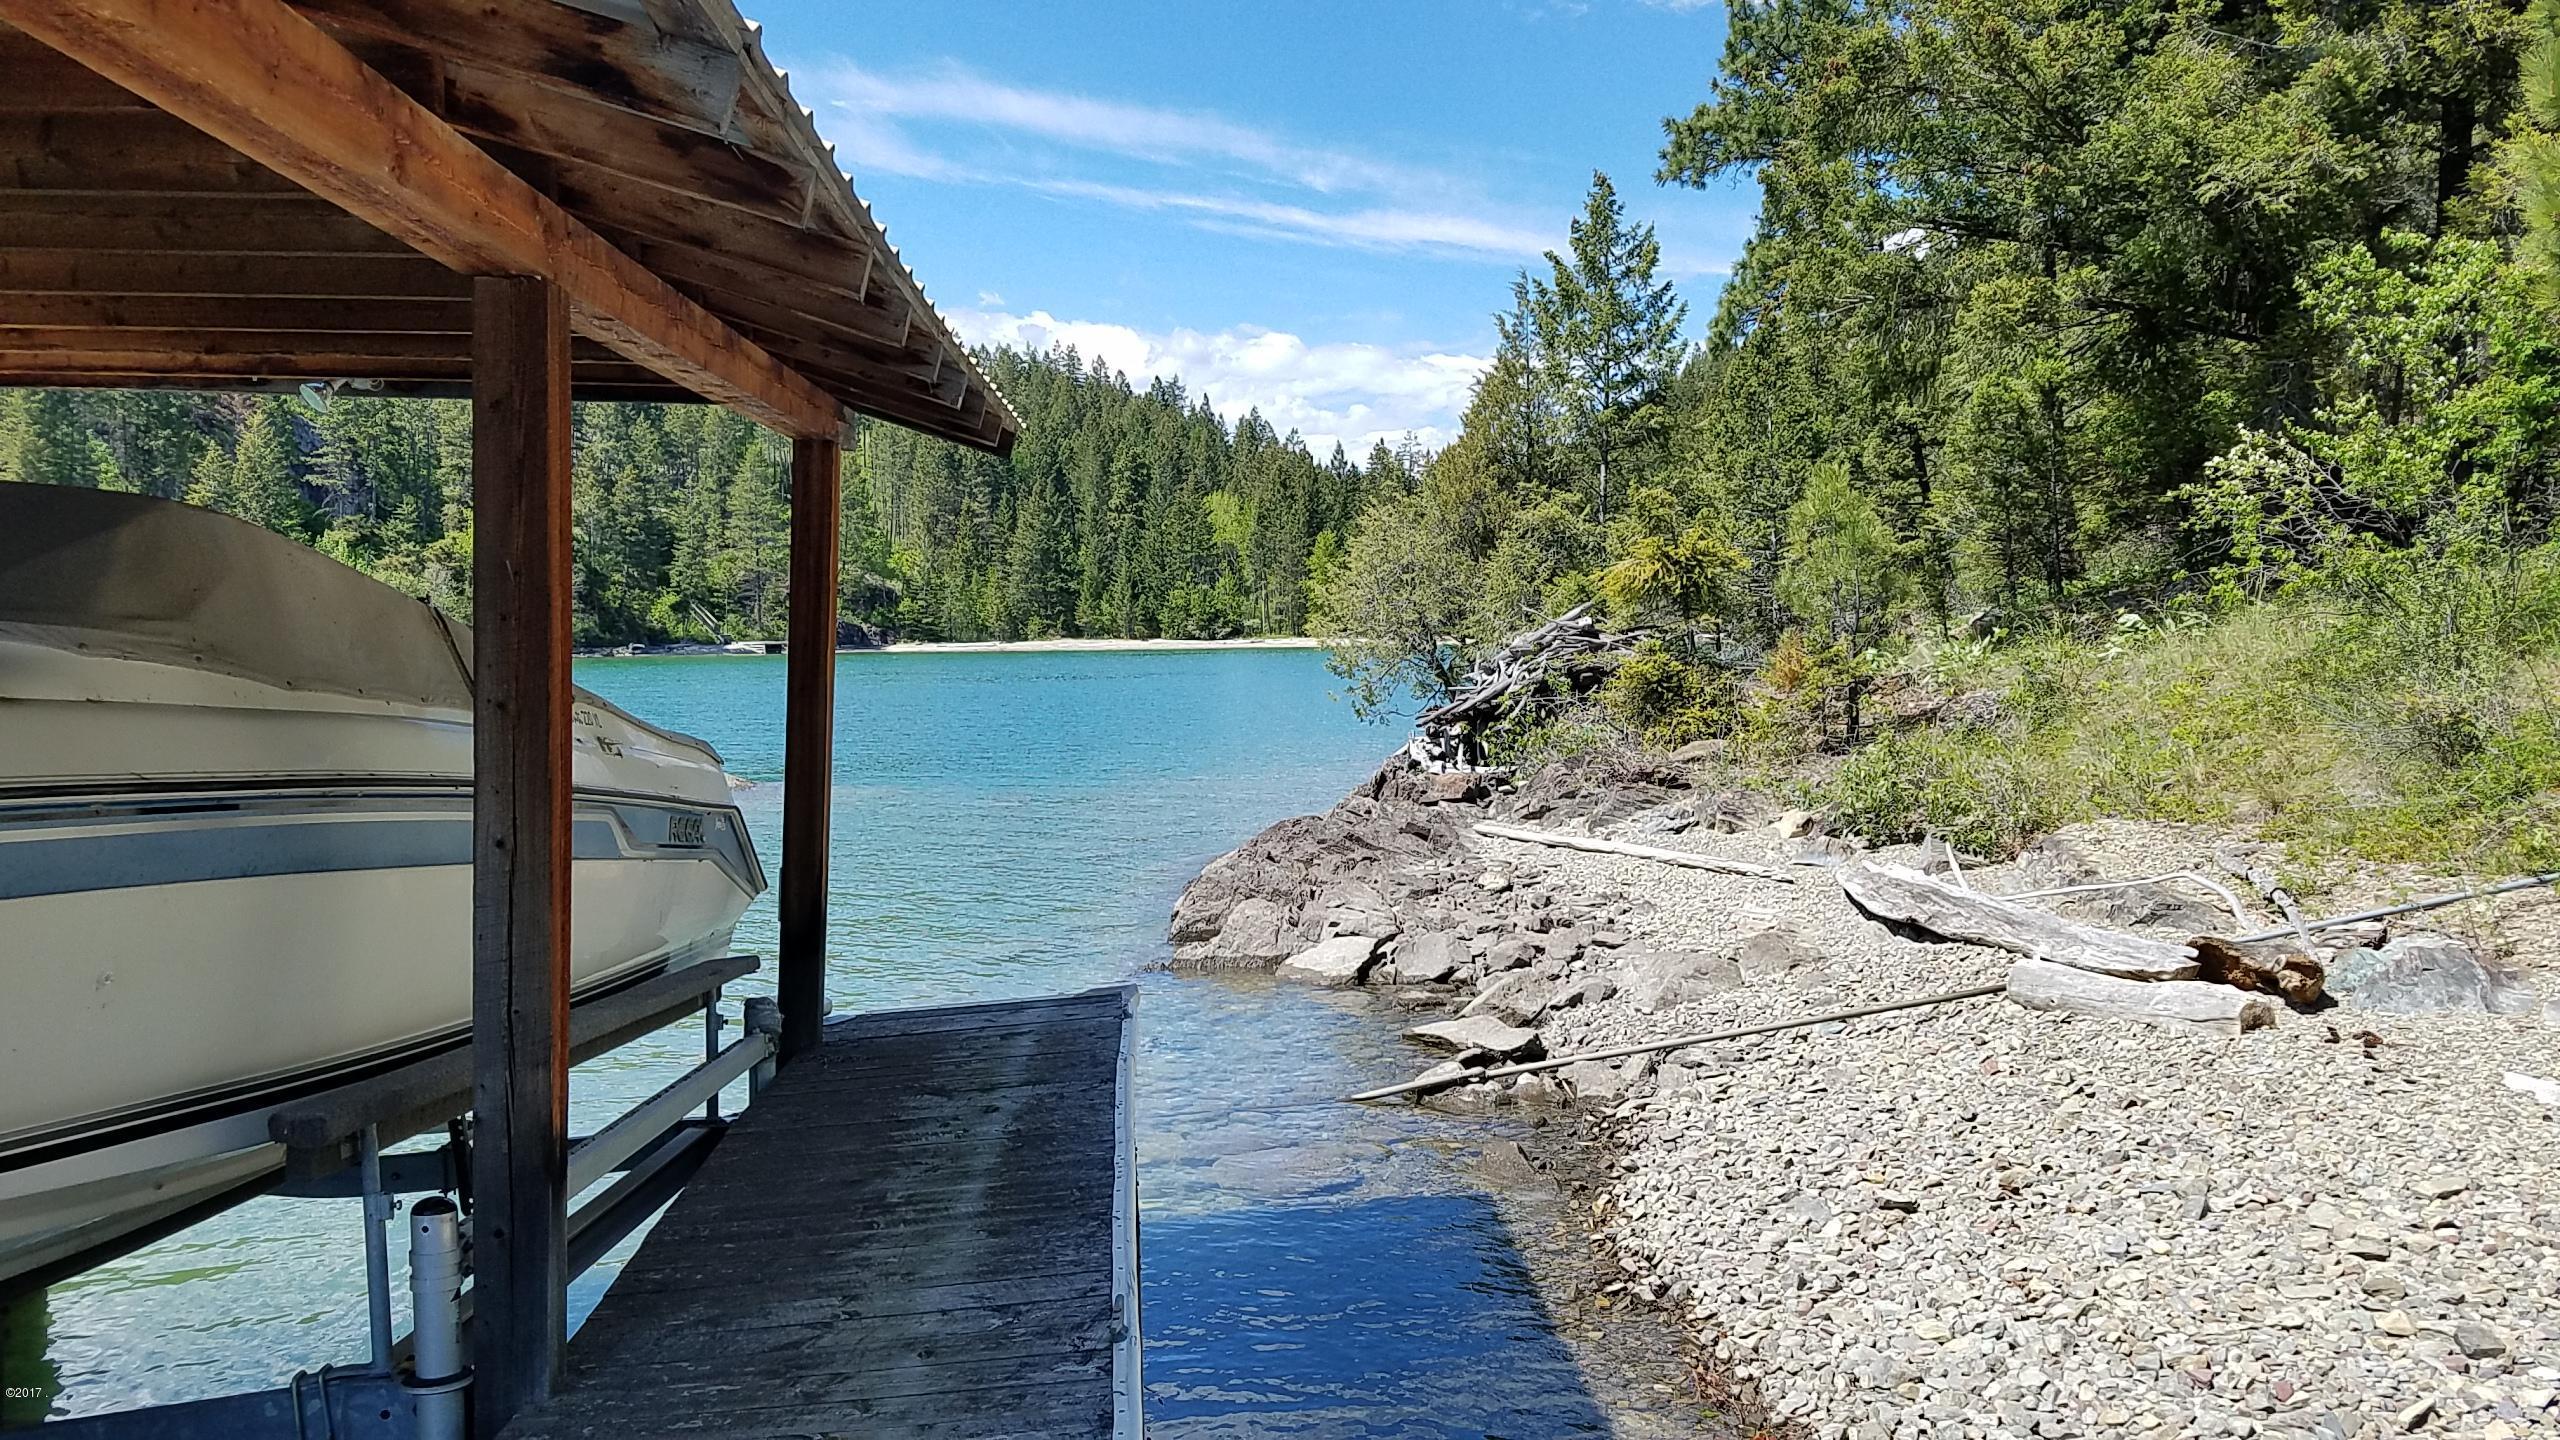 Additional photo for property listing at 743 Hughes Bay Road 743 Hughes Bay Road Lakeside, Montana 59922 United States